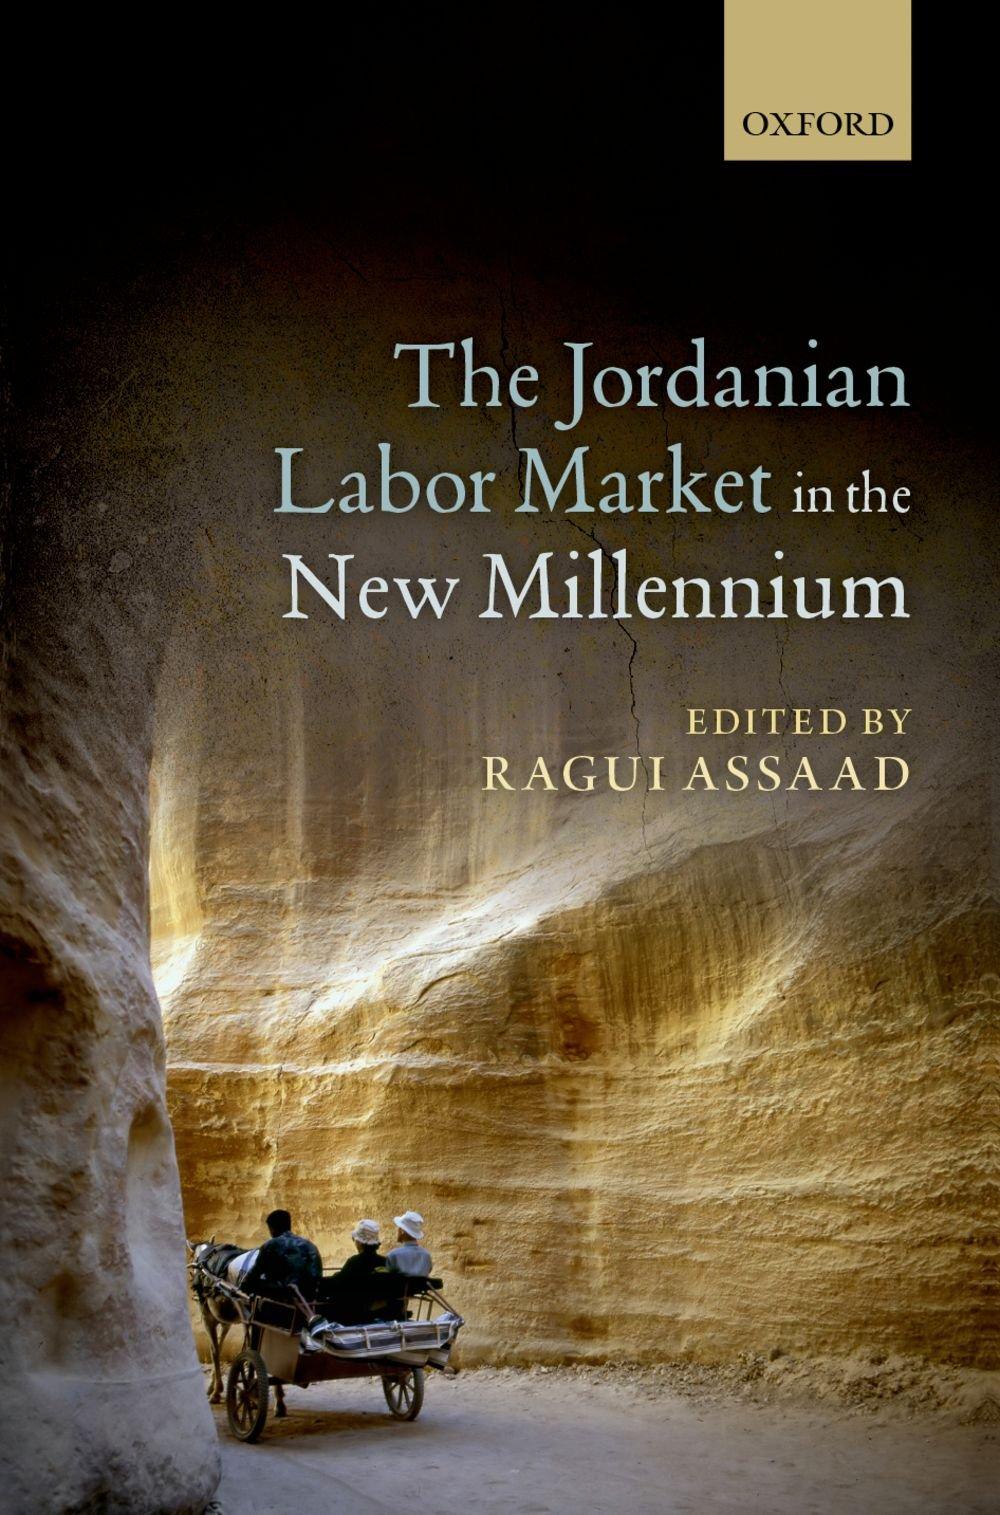 The Jordanian Labor Market in the New Millennium